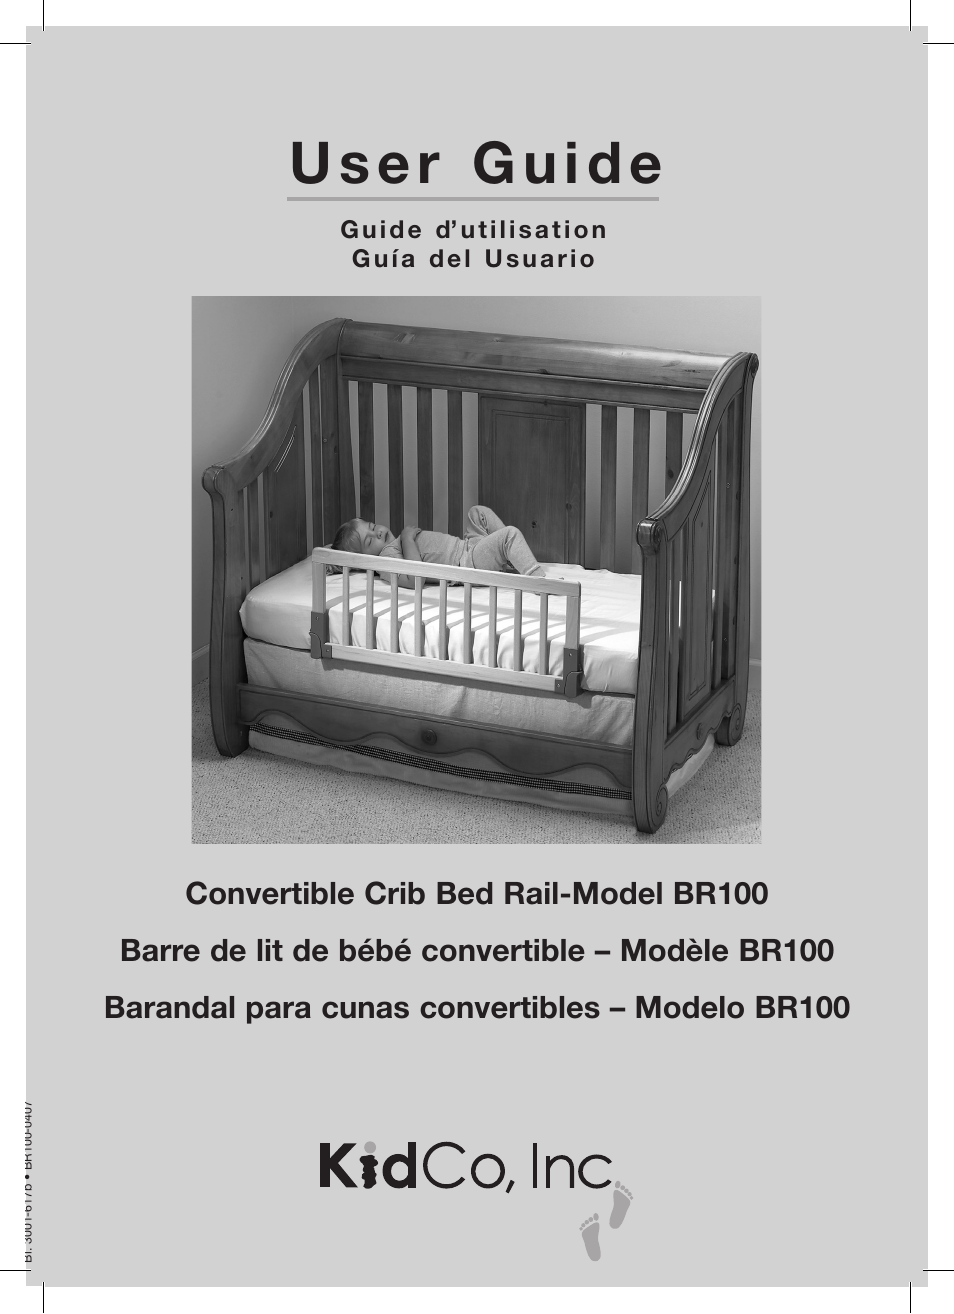 Kidco Br303 Children S Mesh Bed Rail White 2 Pack